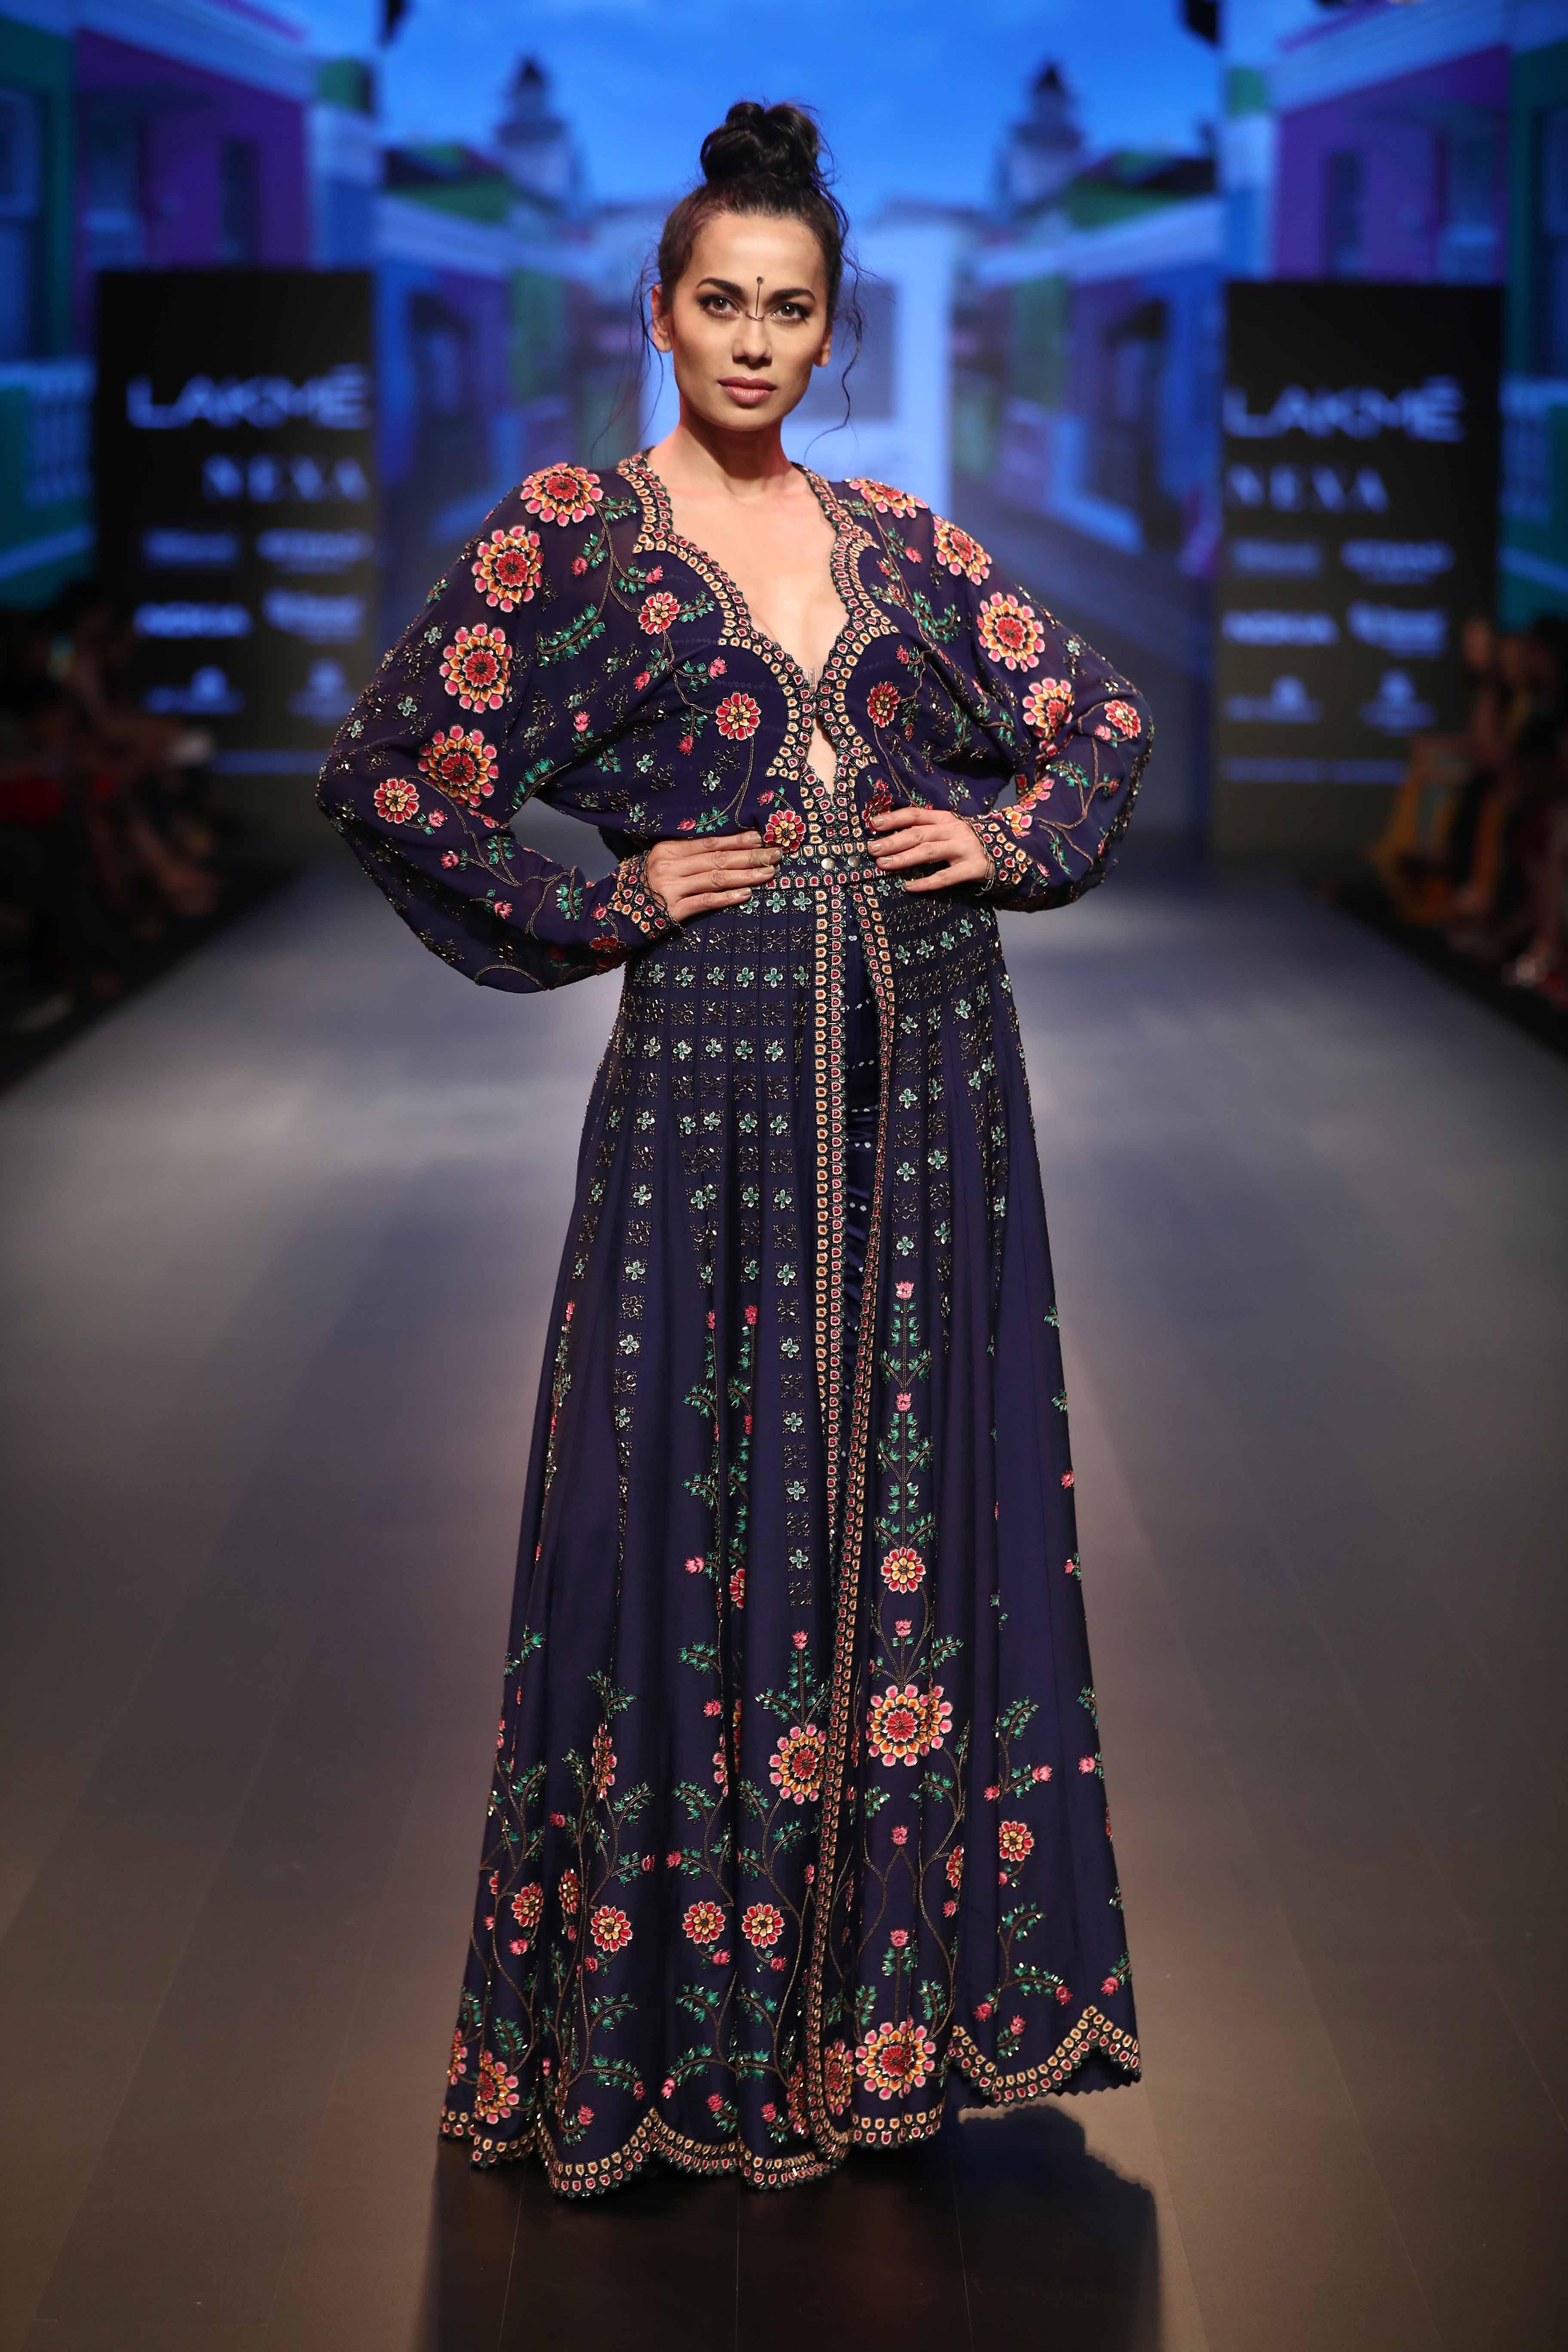 Model poses for Nupur Kanoi at - Lakme Fashion Week Winter Festive 2018